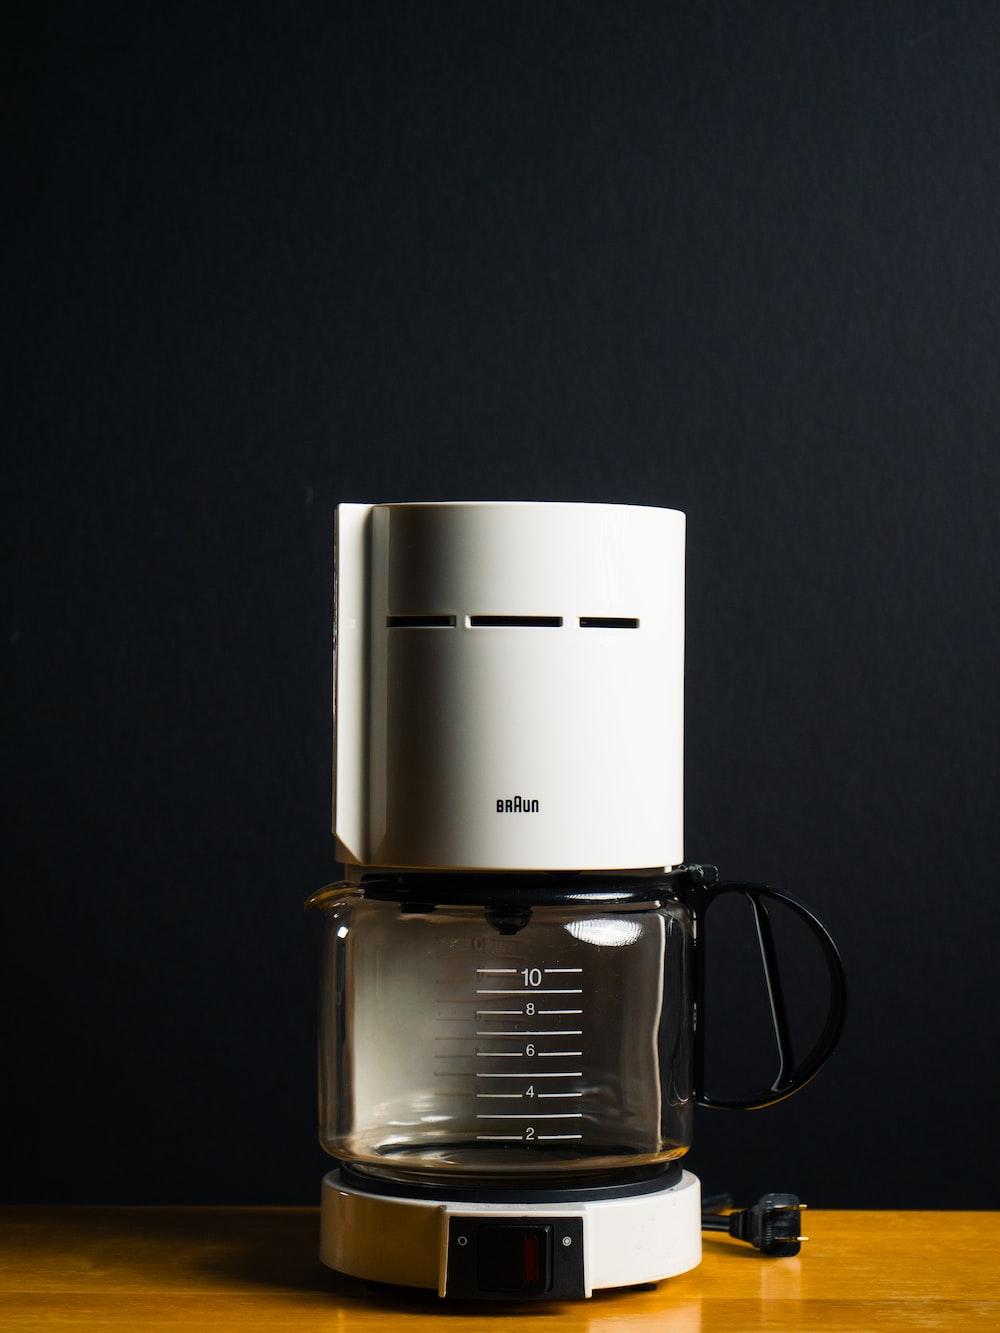 white and black coffeemaker